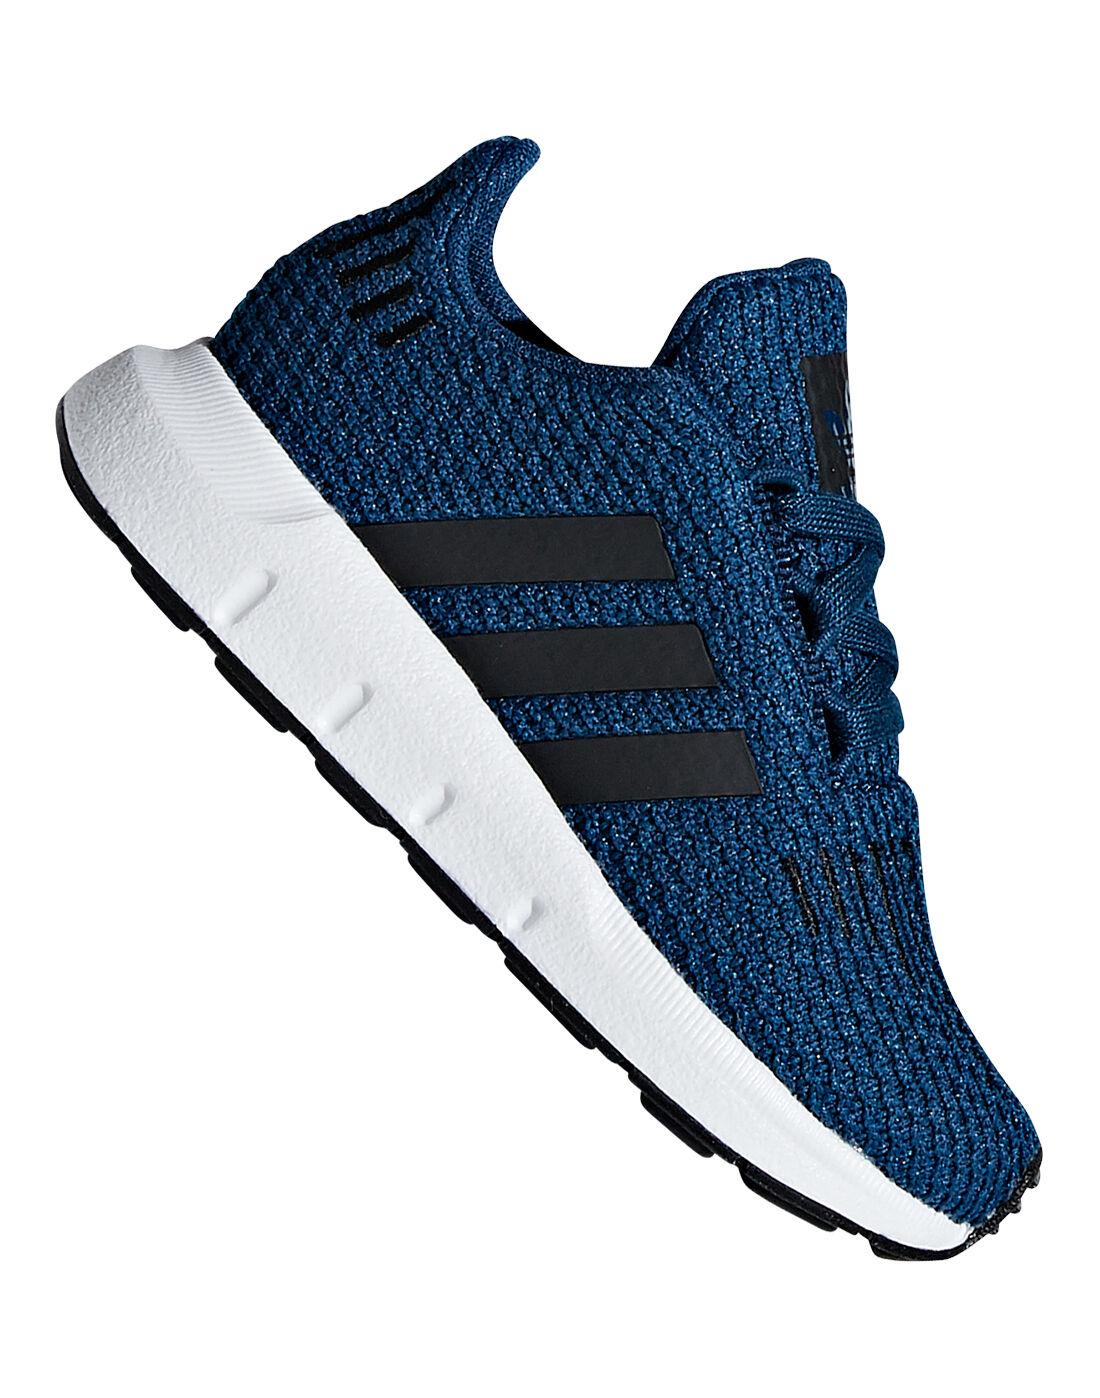 Blue adidas Originals Swift Runs